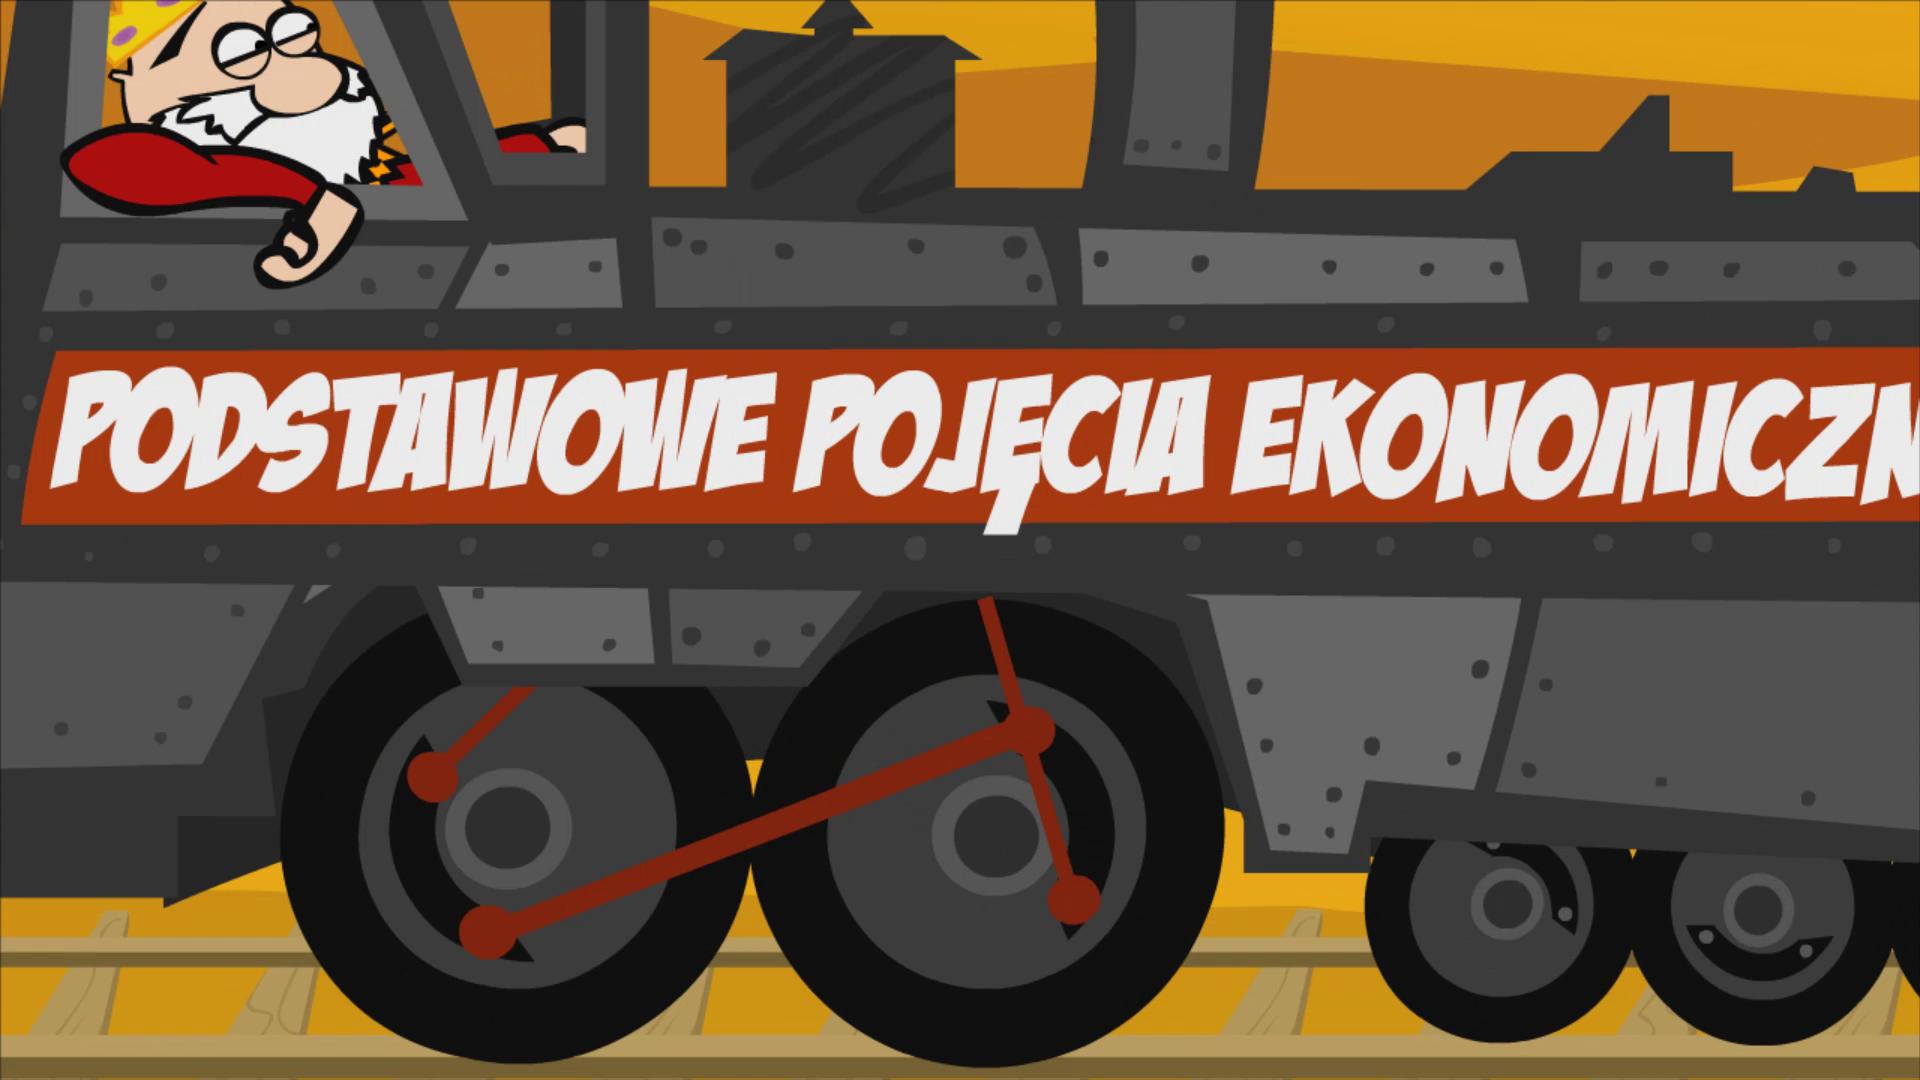 PPE3: Cykl koniunkturalny